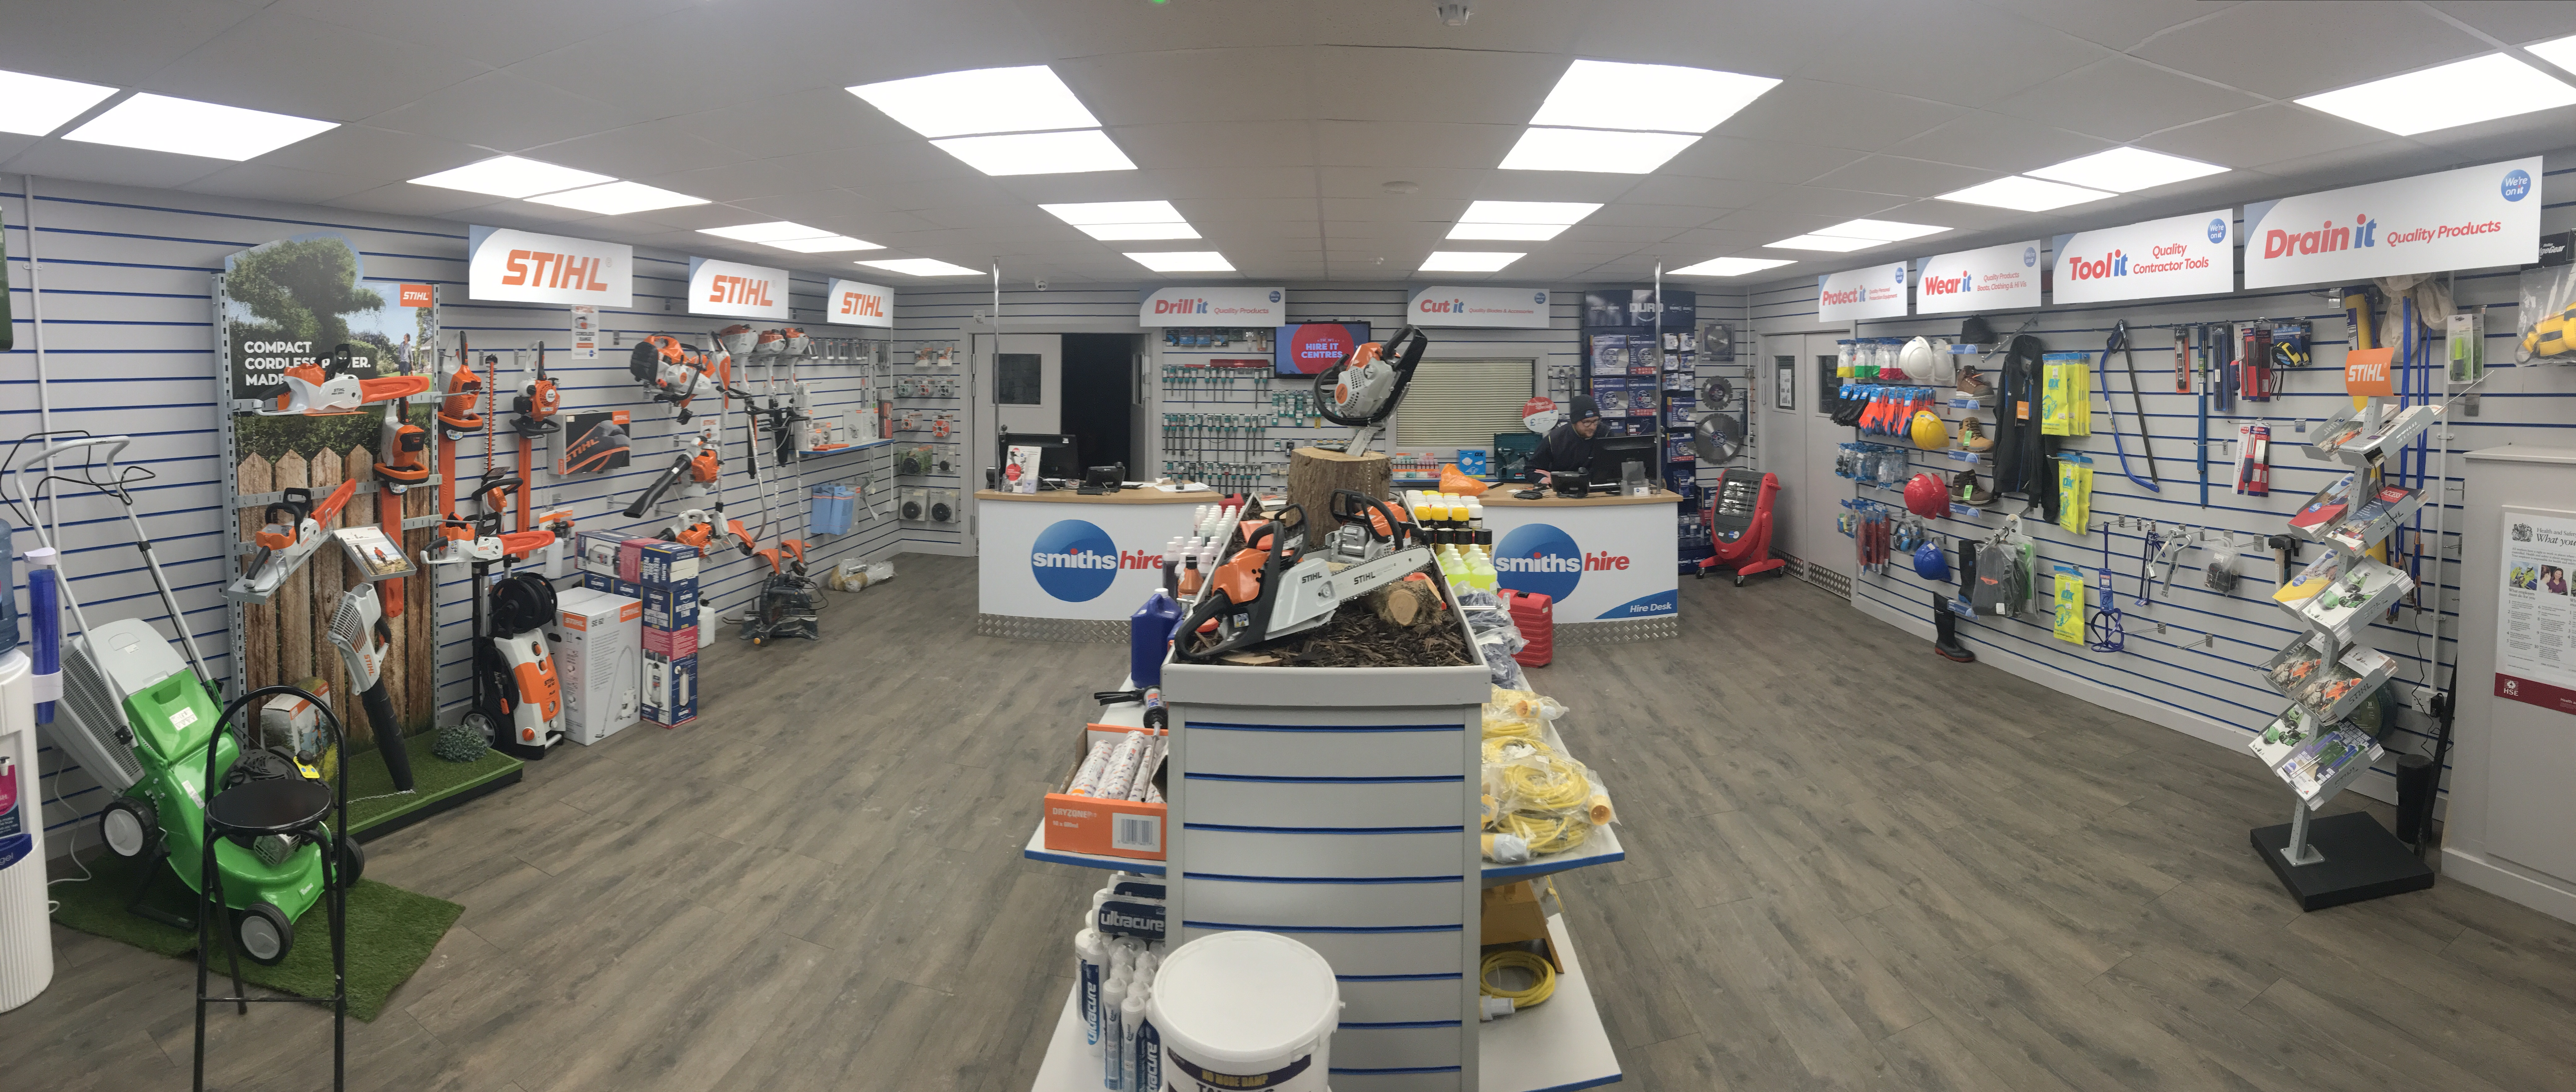 Shop fitting and refurbishment